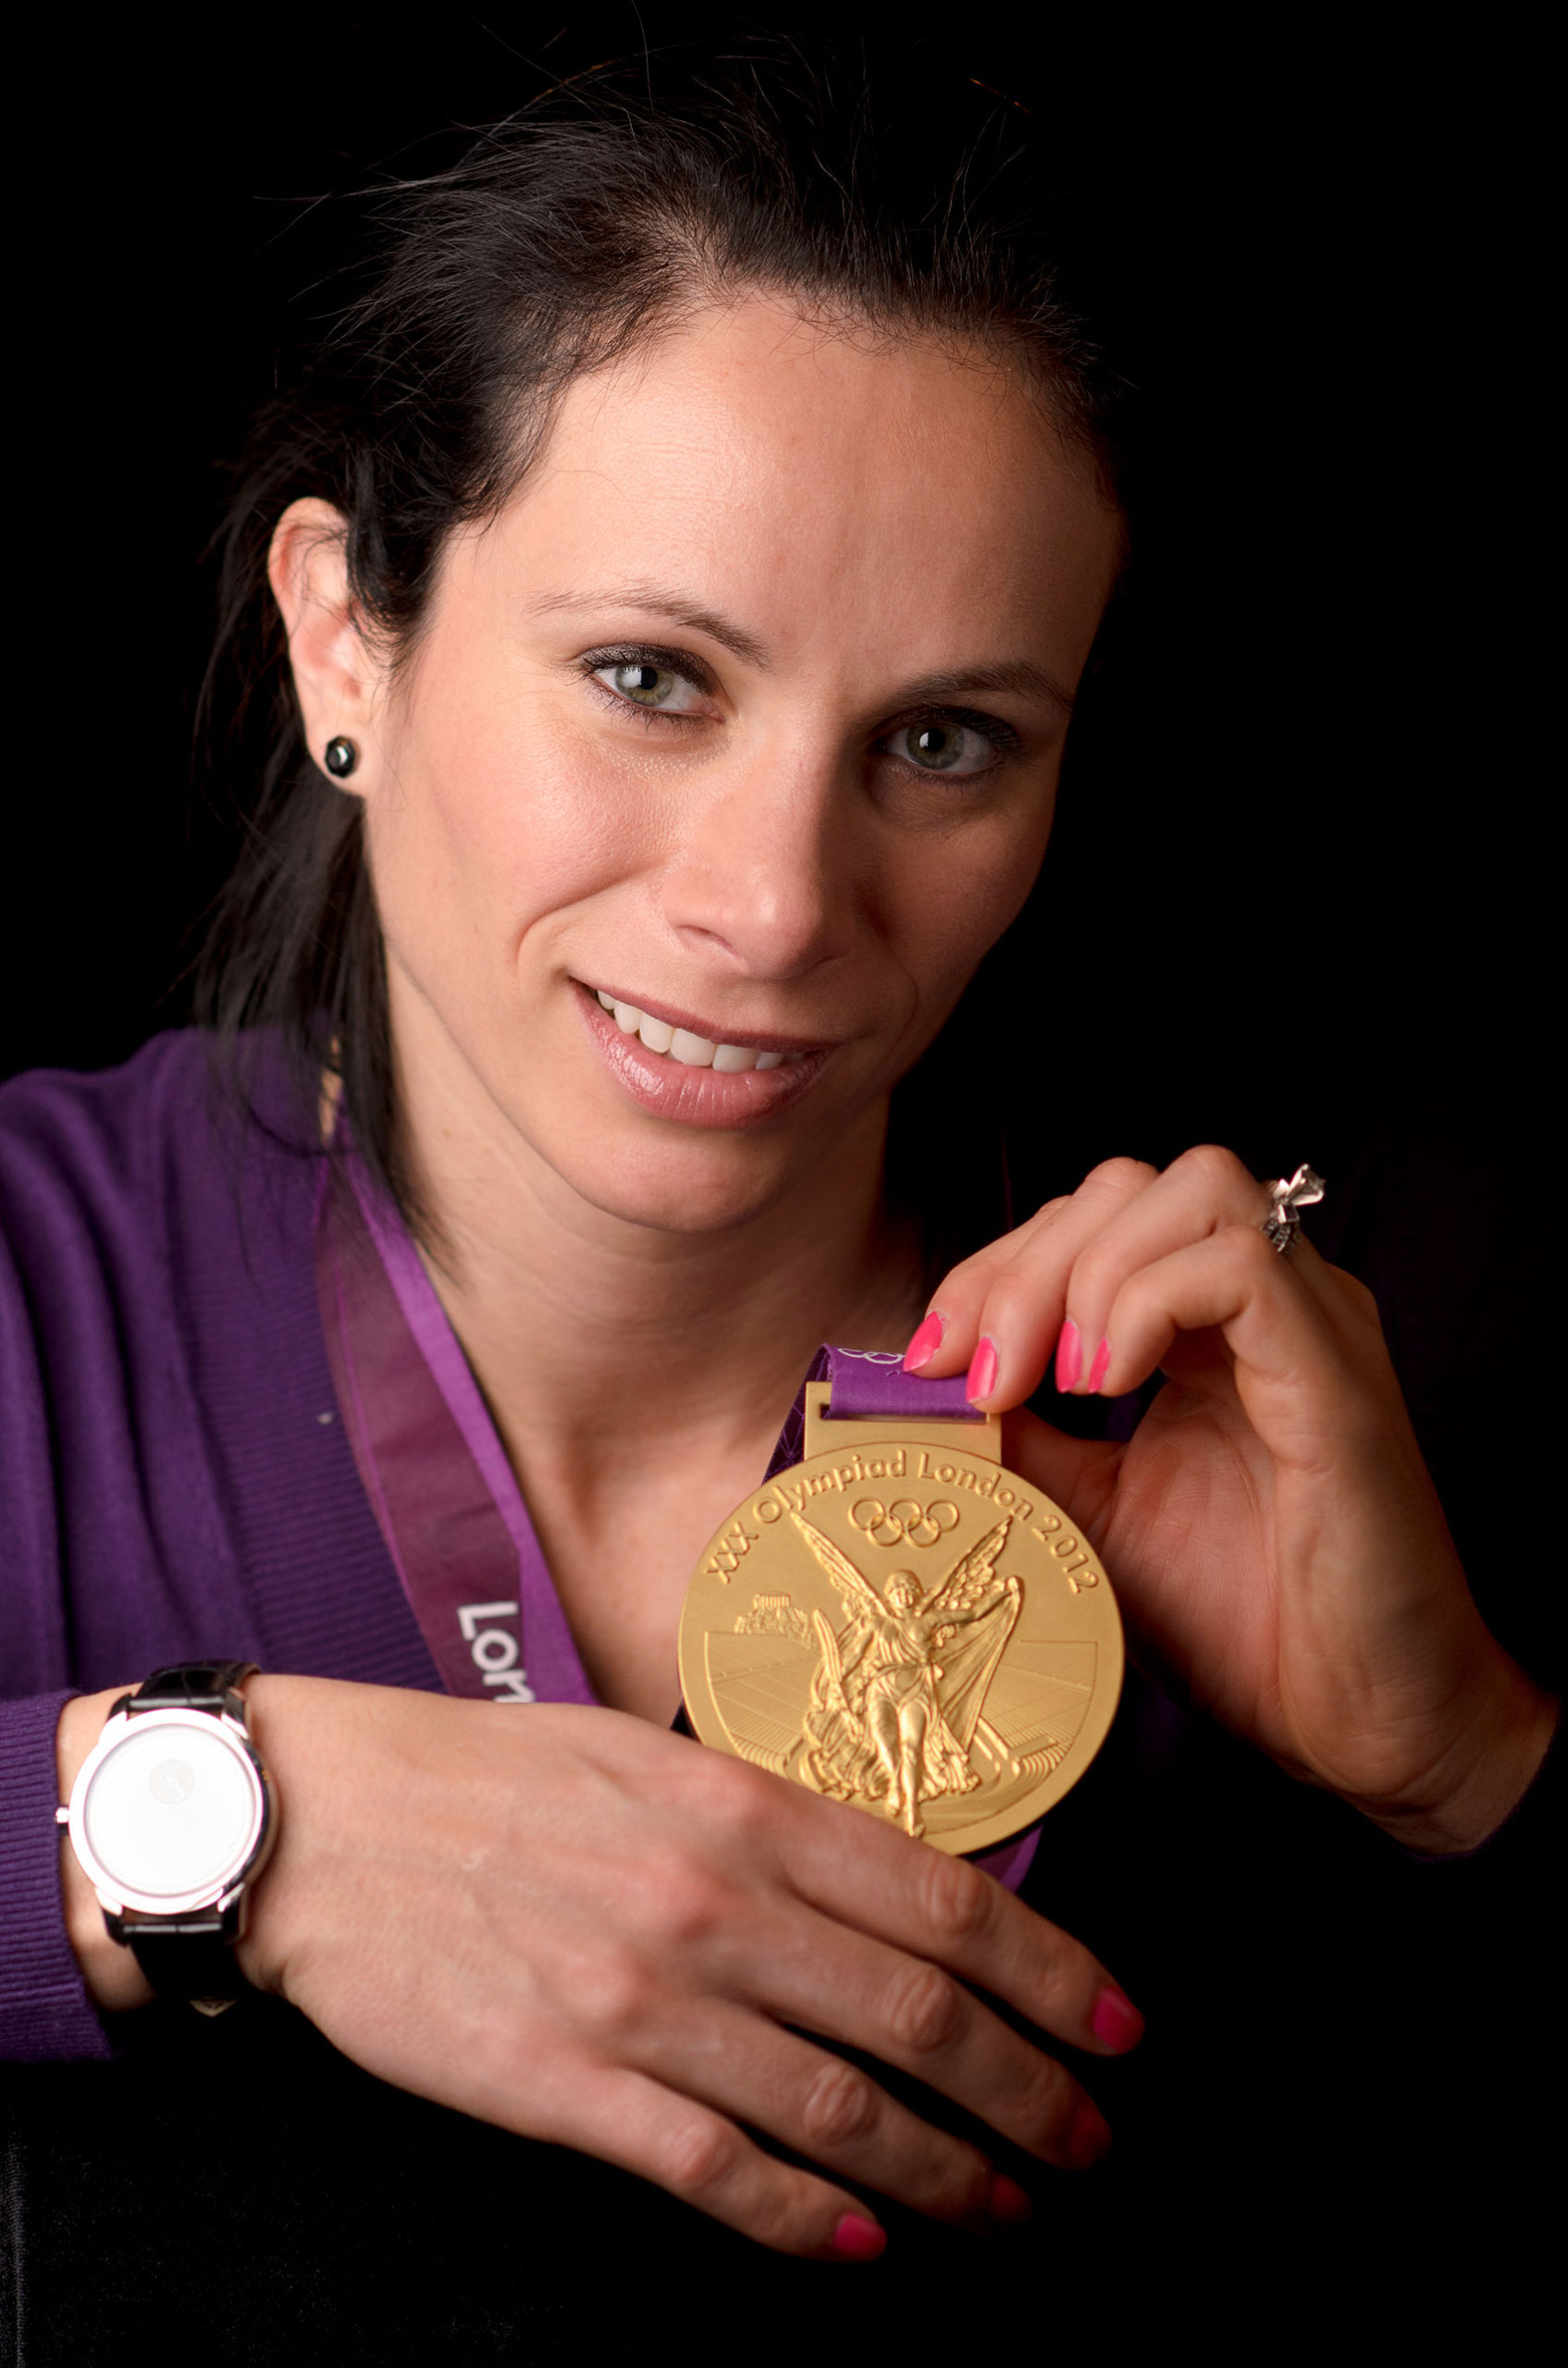 Jenn Suhr Olympics And World Champion In Pole Vault